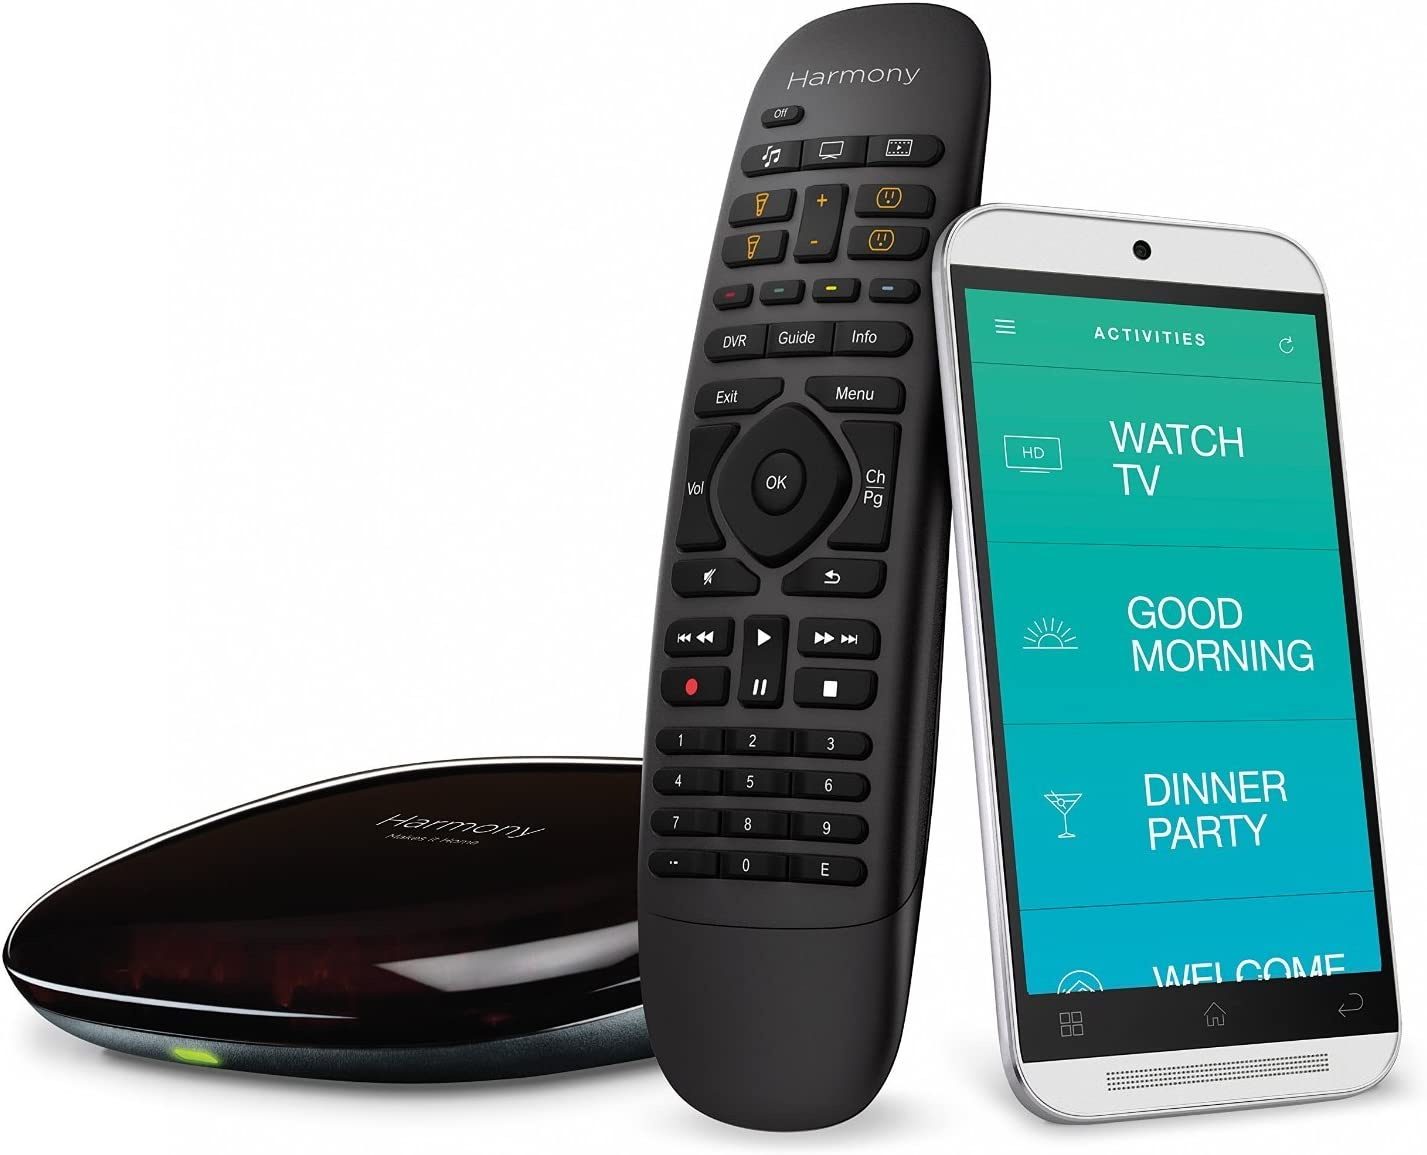 Logitech Harmony Home Control - 8 Devices (Black) (Renewed)